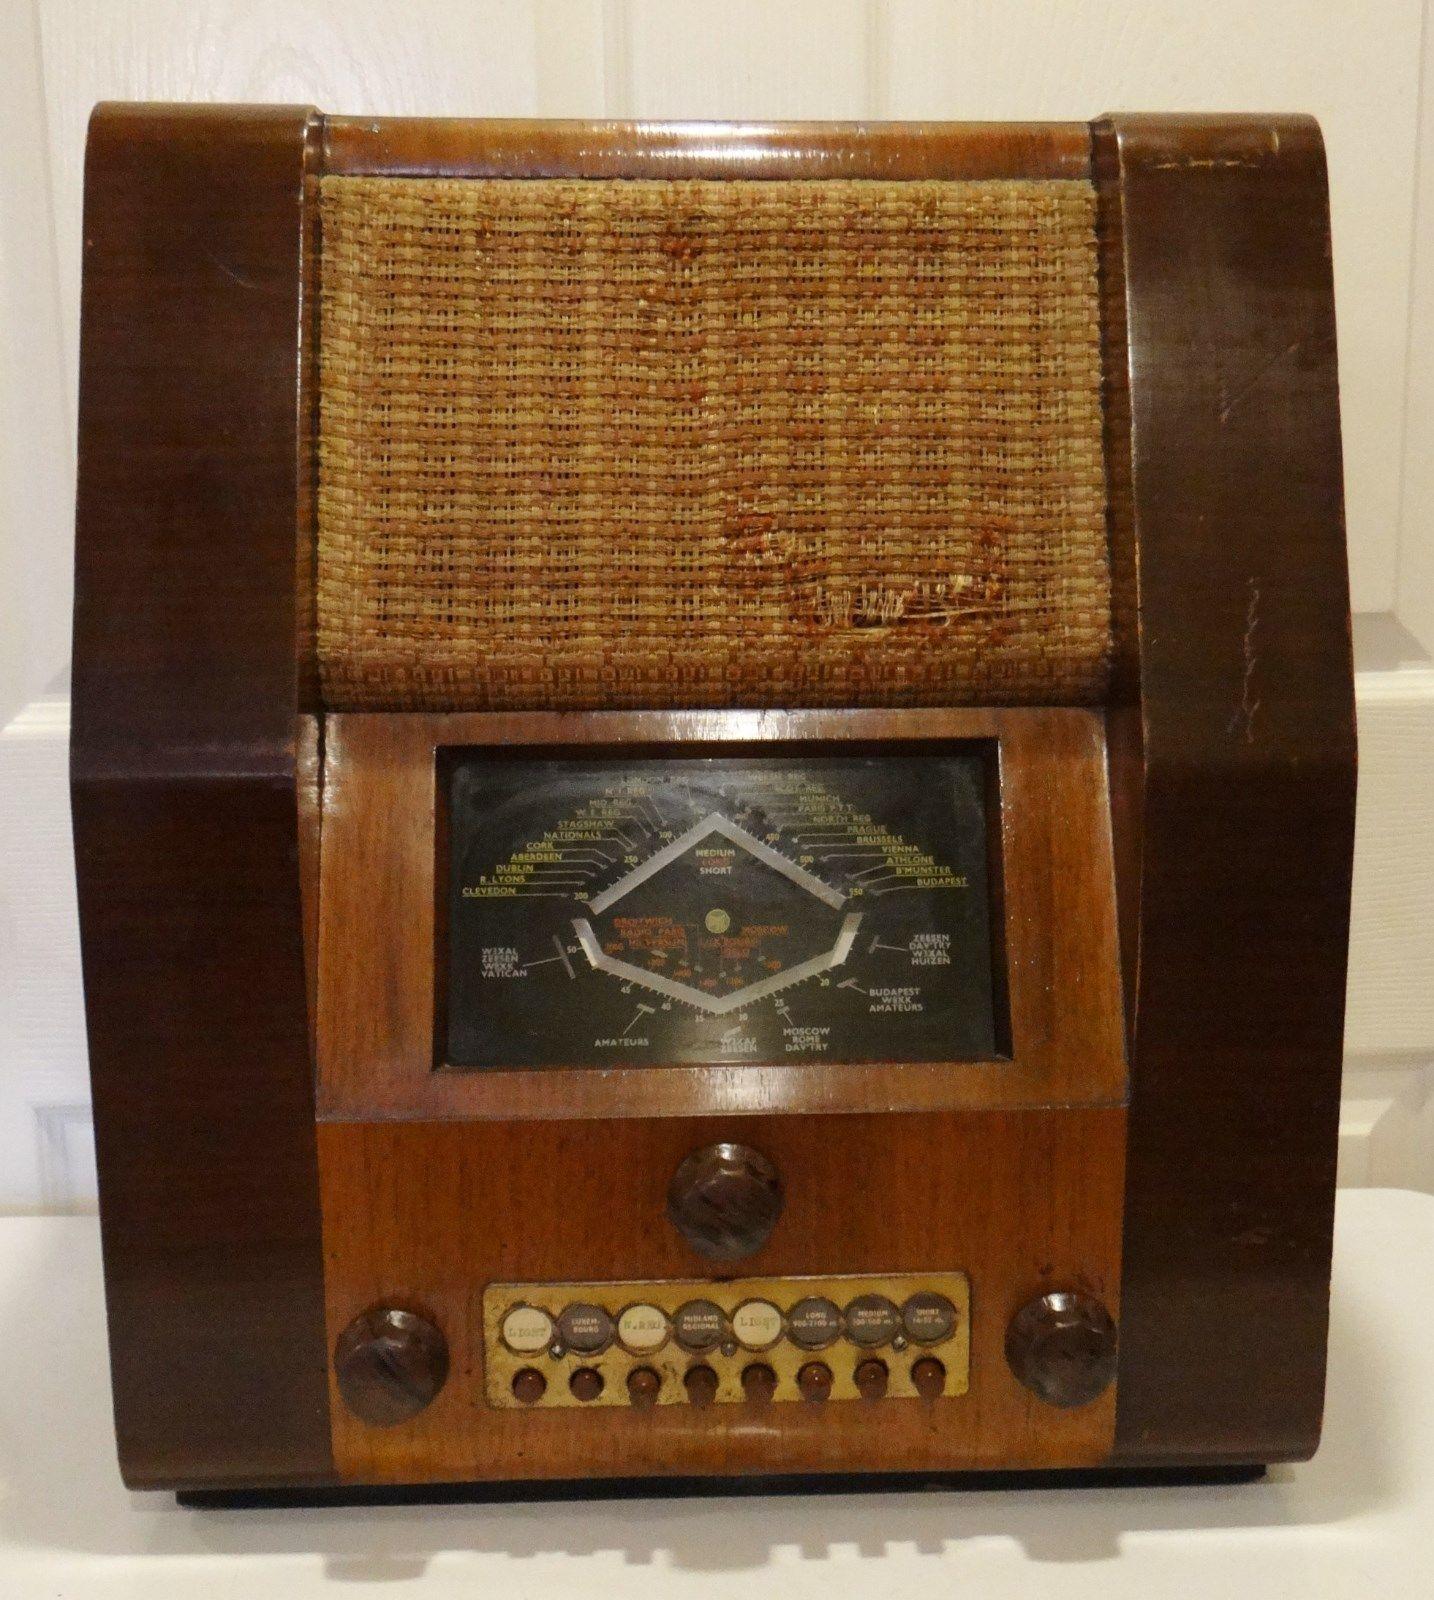 Beautiful Vintage 1933 Pye Tube Radio Restored Working British Vintage Radio Antique Radio Retro Radios